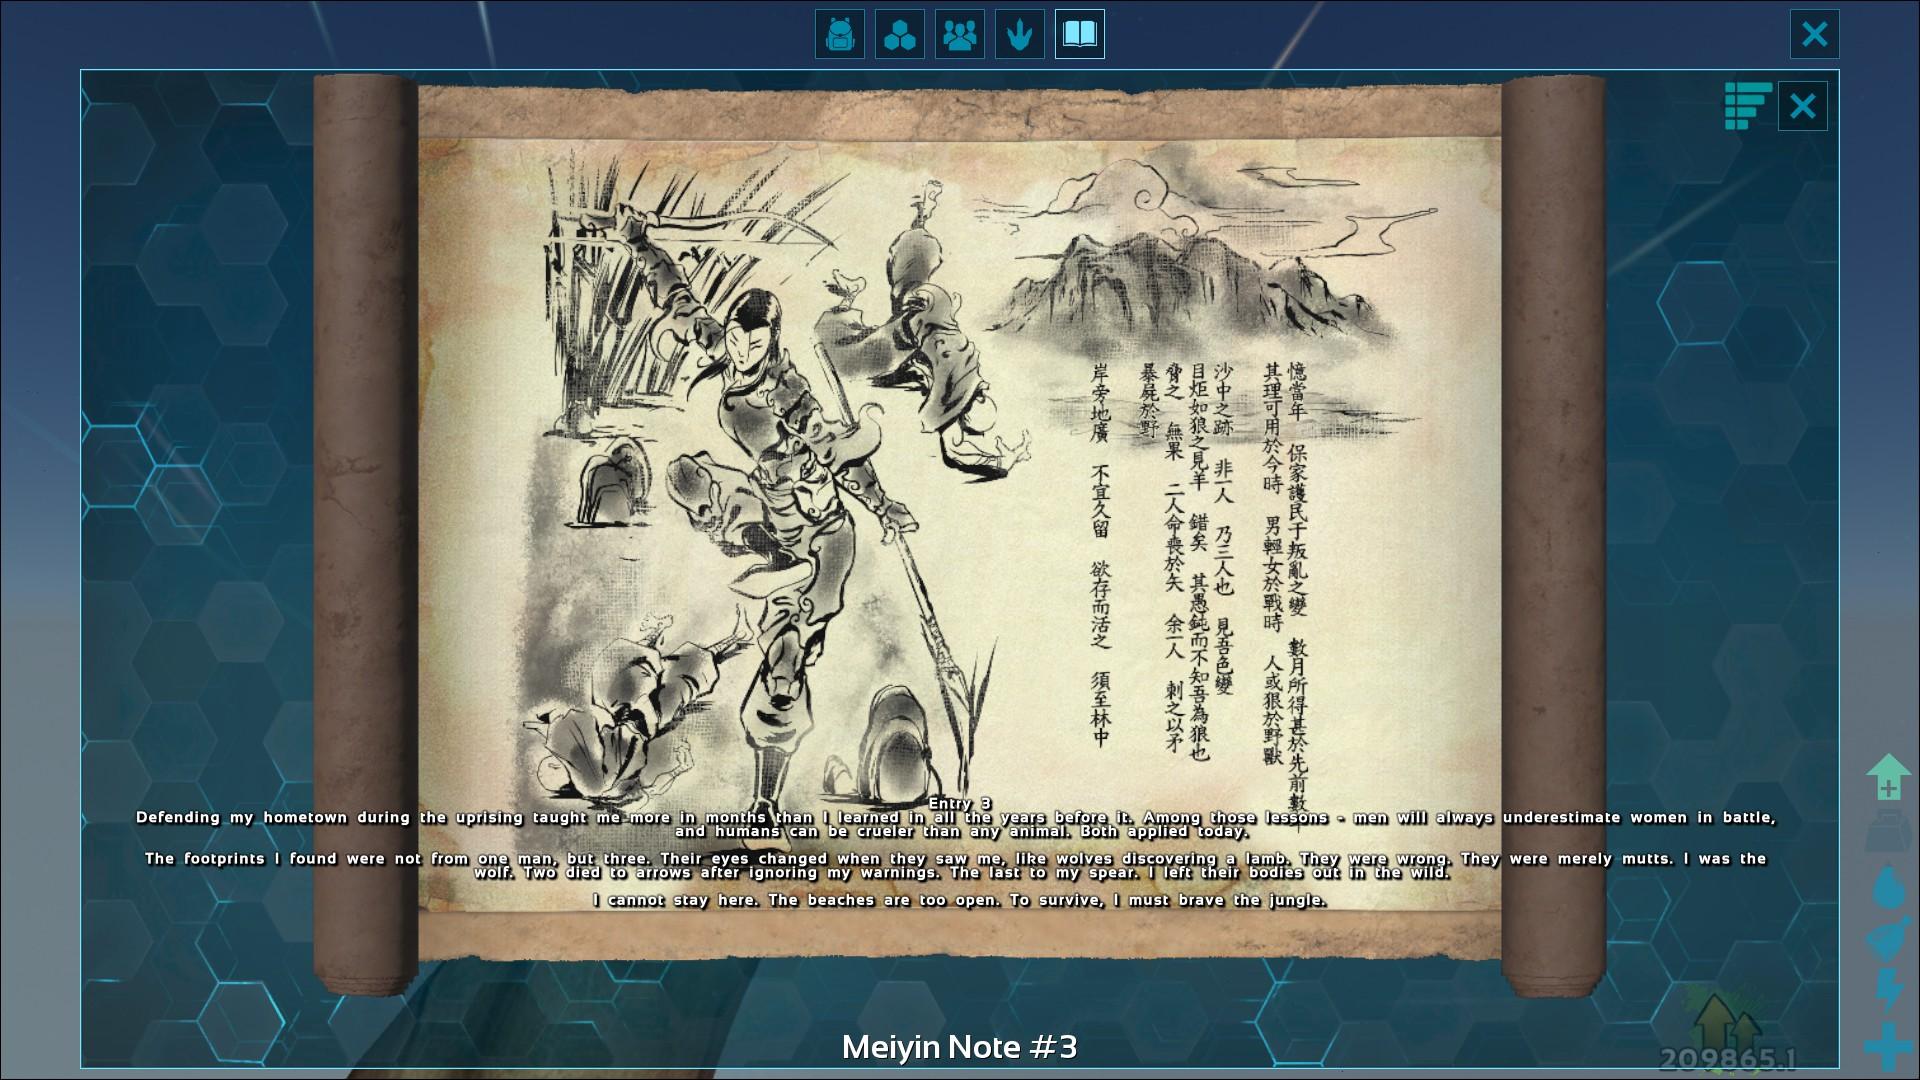 Mei-Yin Explorer Note